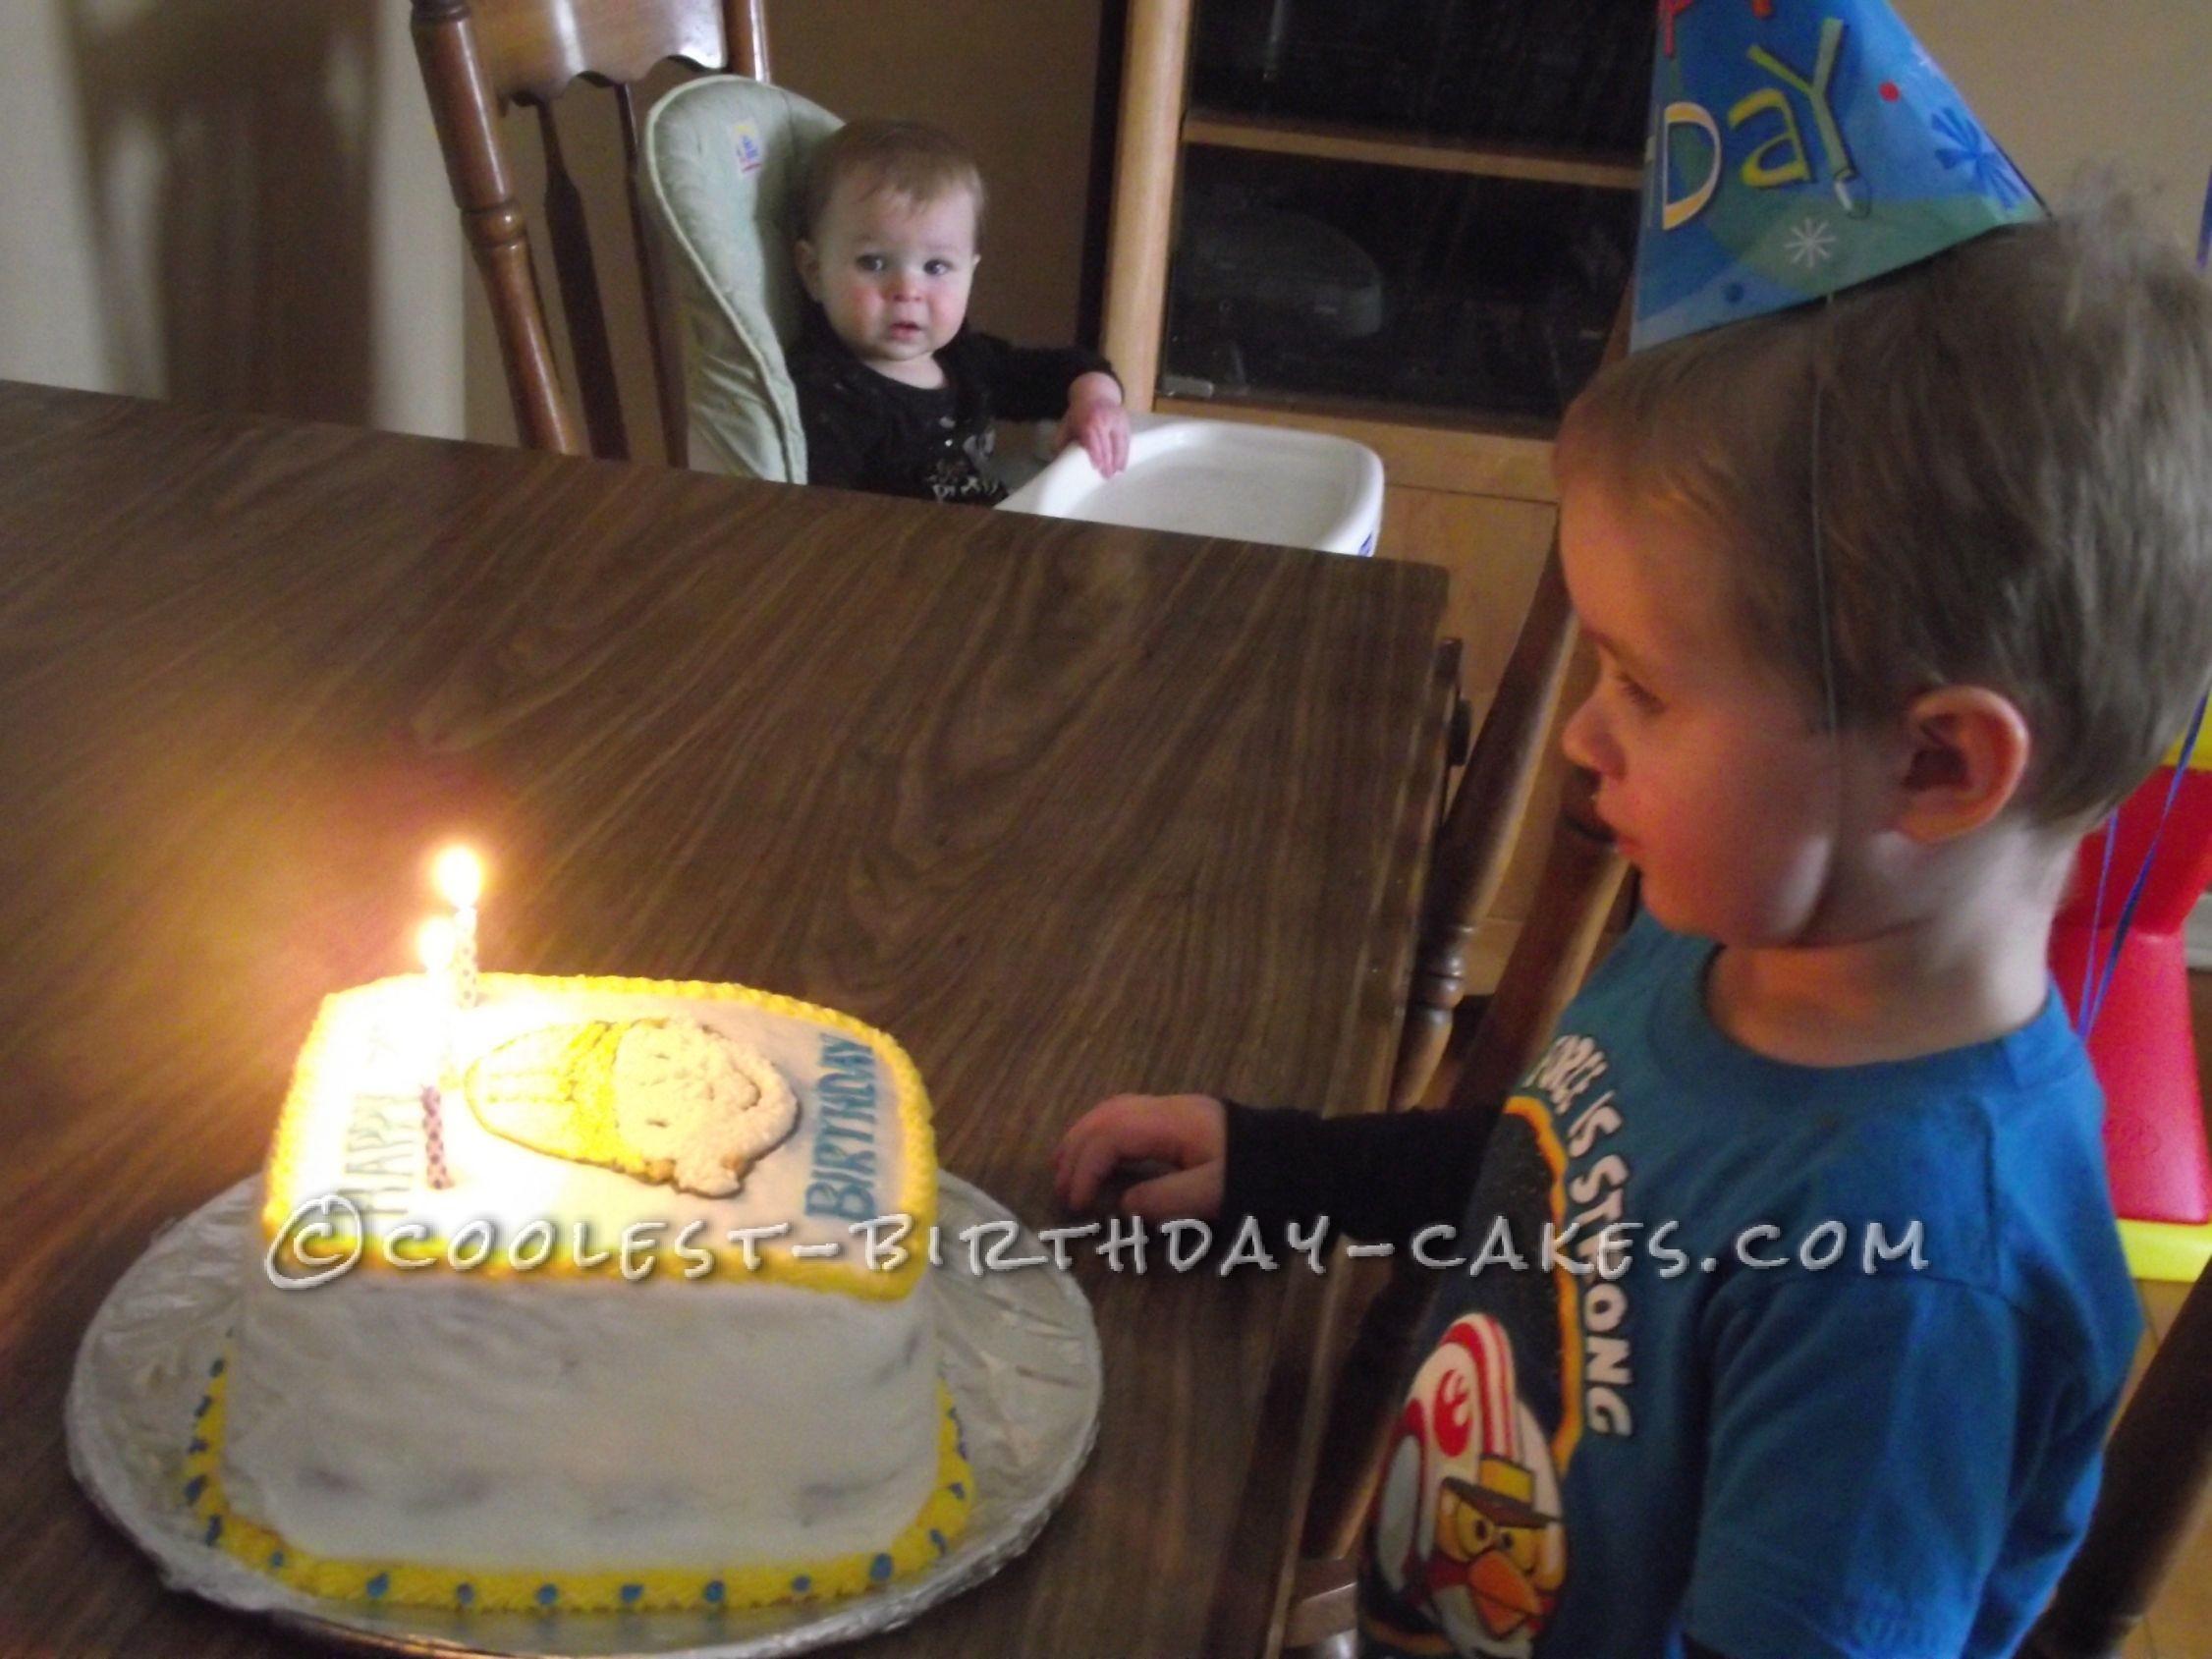 Coolest Bob the Builder Birthday Cake